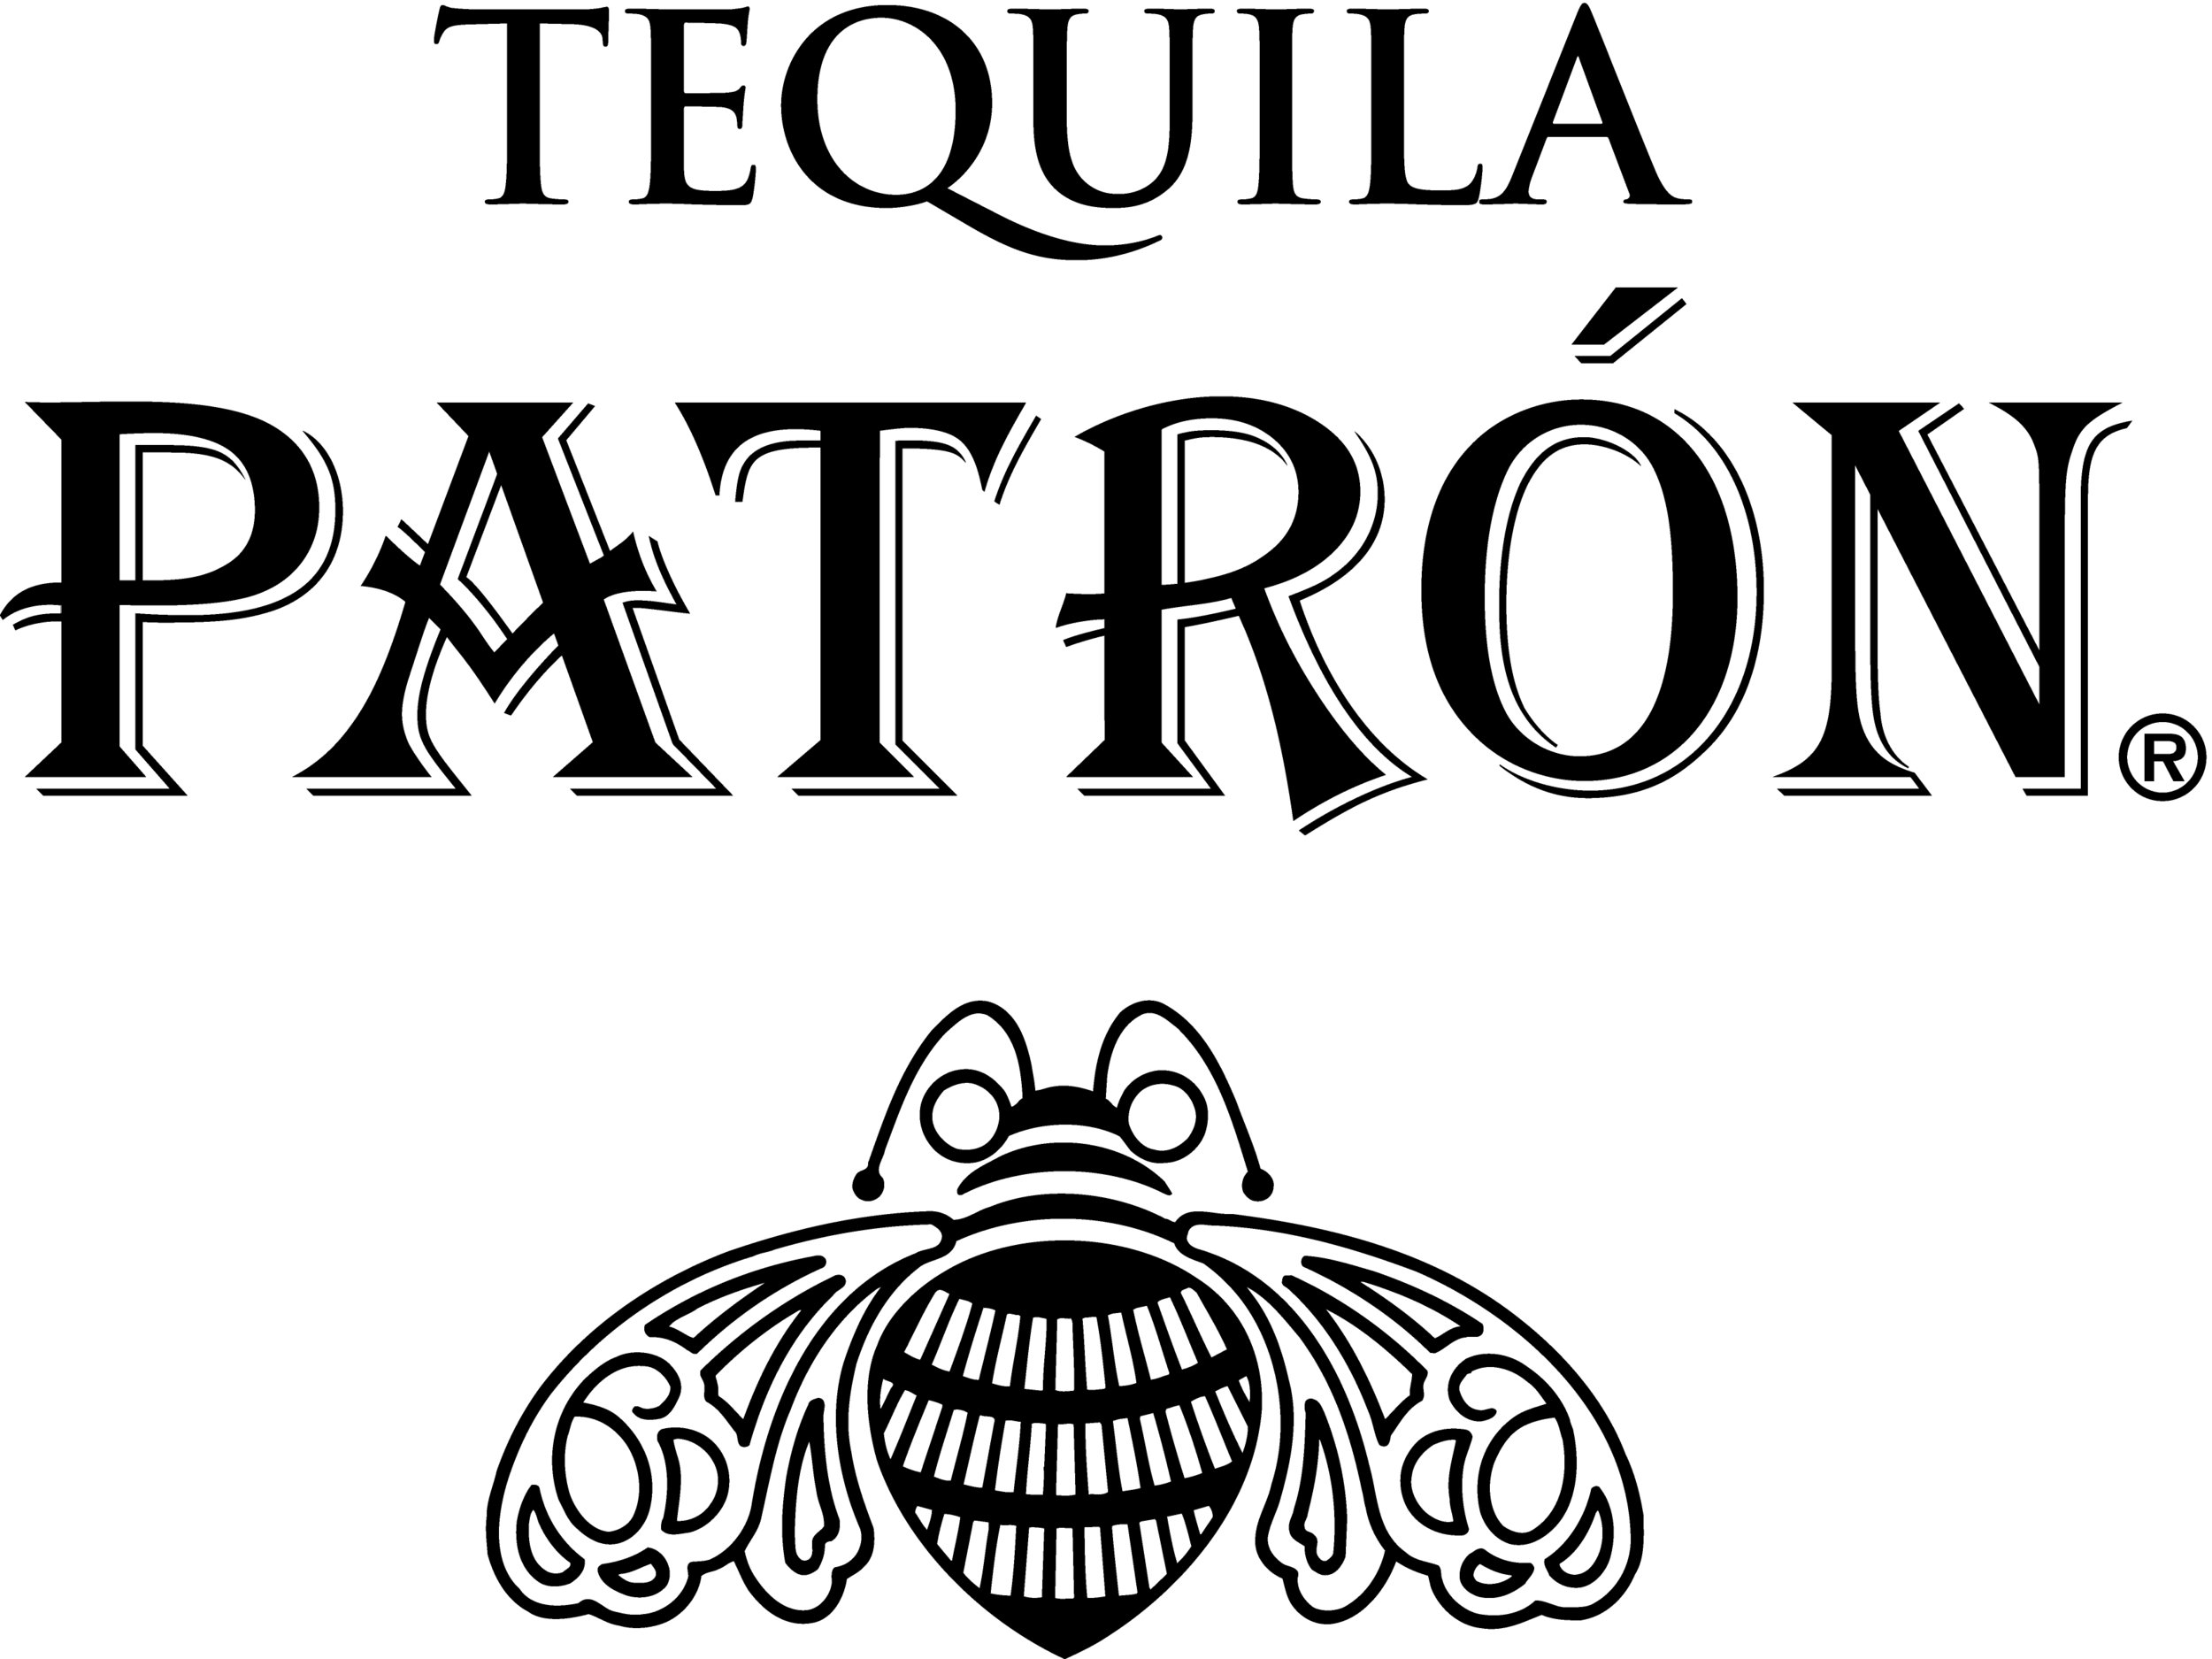 PATRON_Logo-3440x2580.jpg